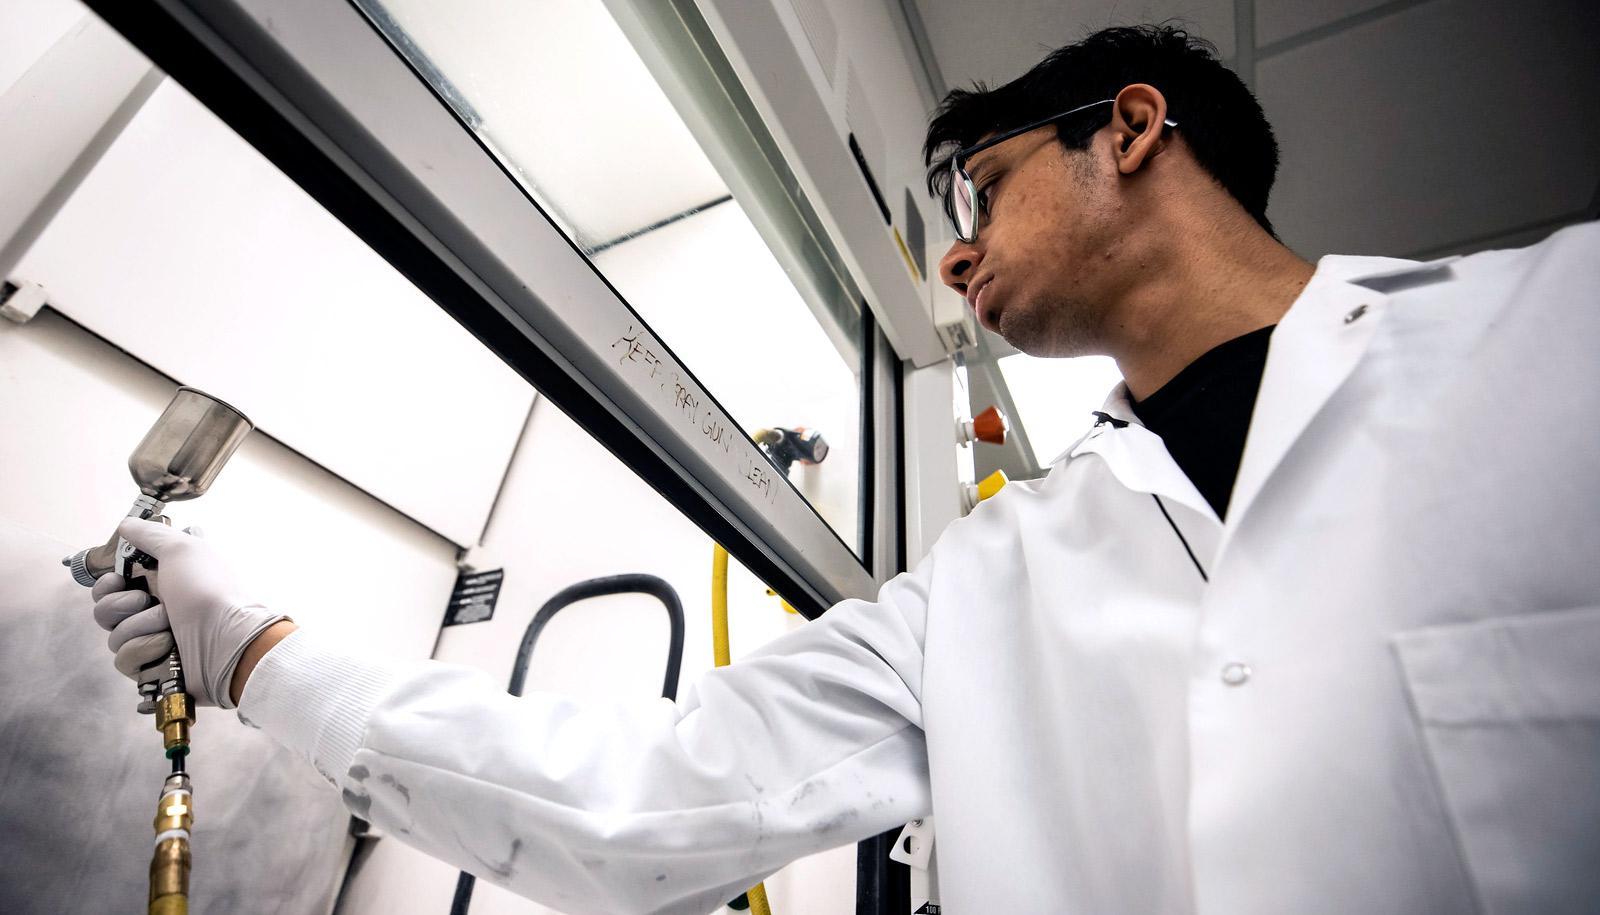 researcher in lab coat sprays coating